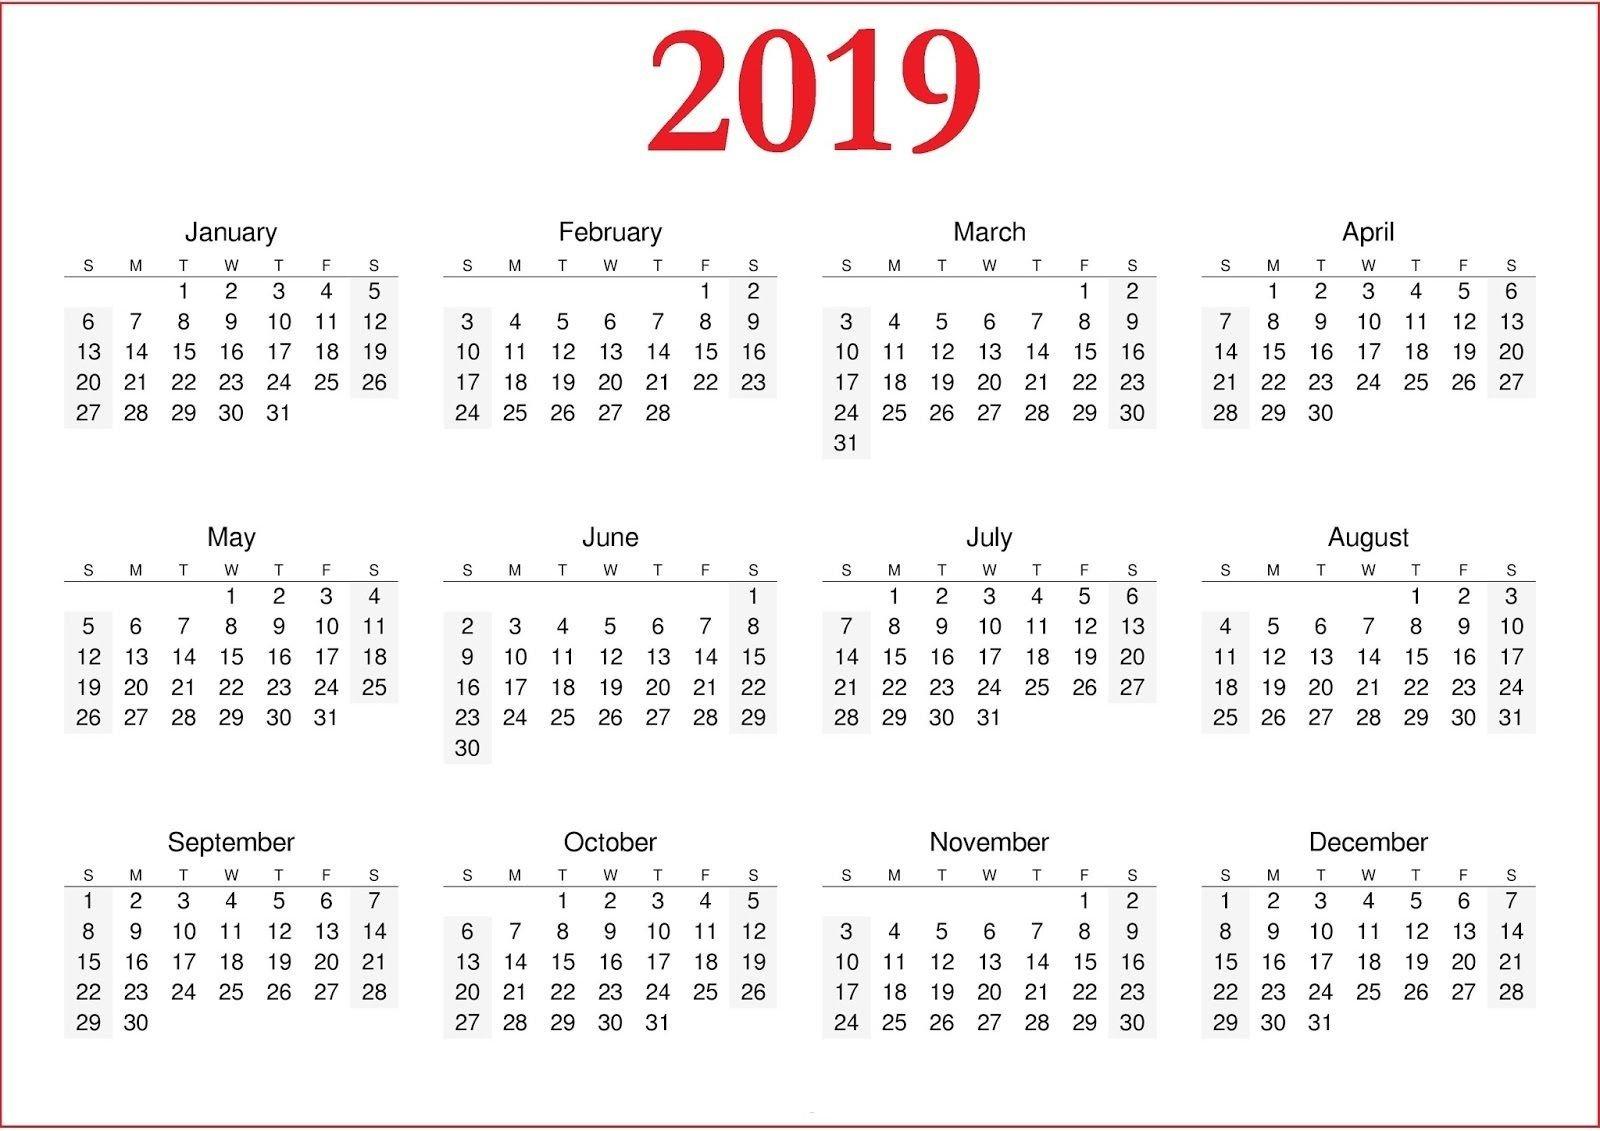 2019 Calendar Printable Nz   Yearly Calendar In One Page   Printable Calendar 2019 Nz